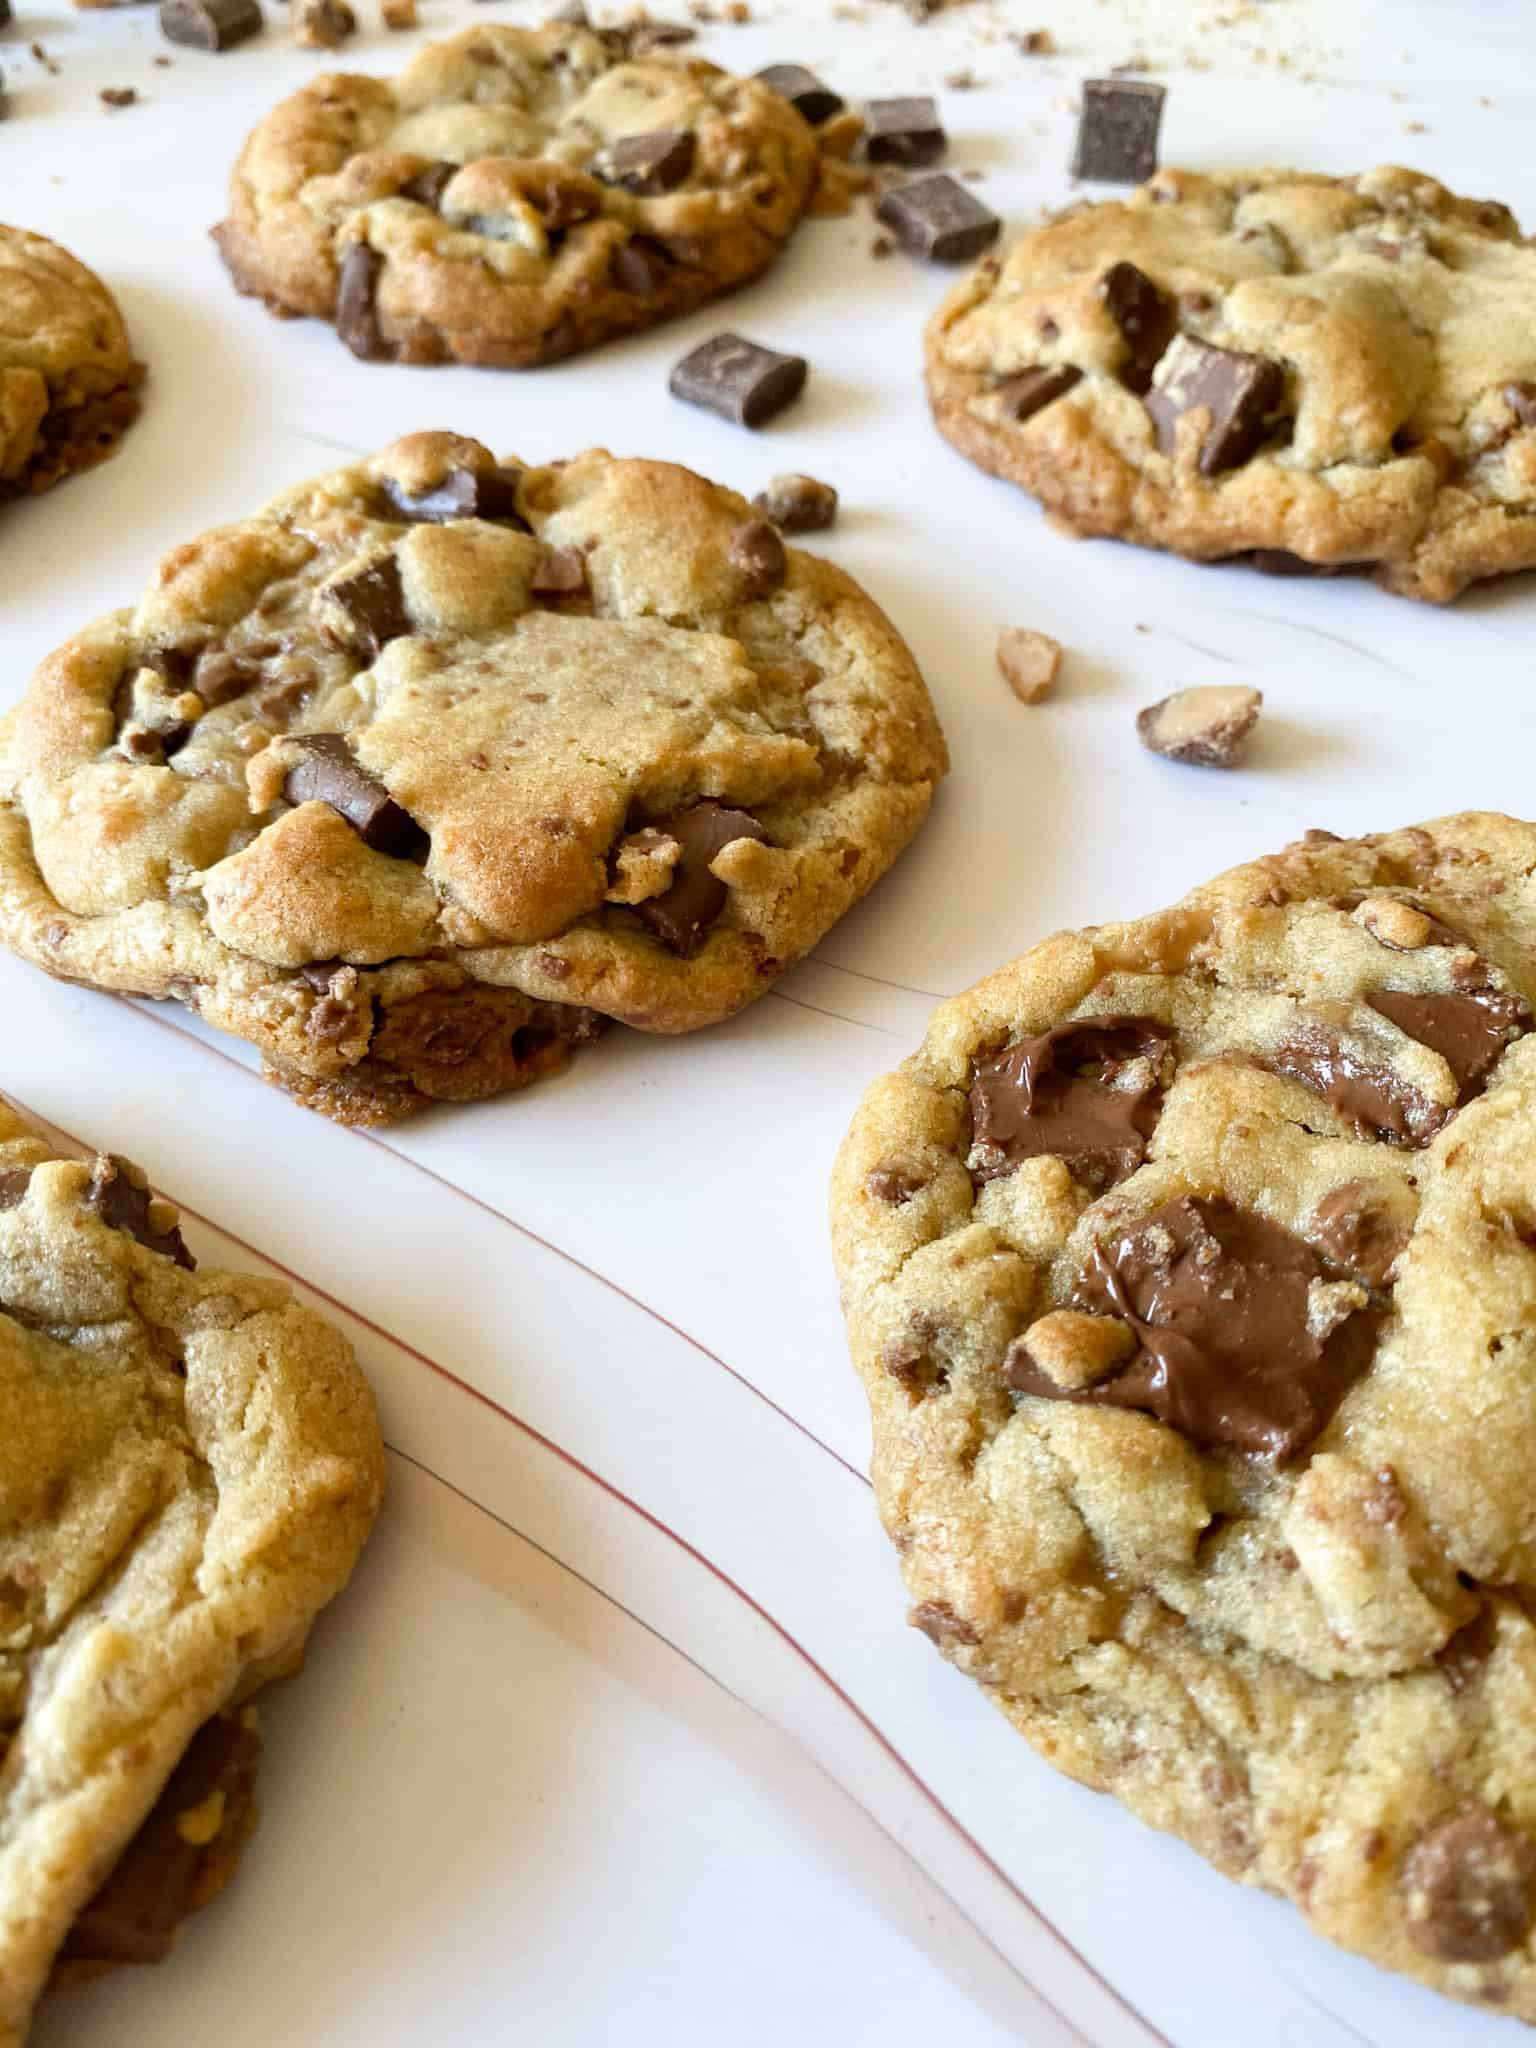 gooey chocolate chunk cookies with toffee and chocolate chunks